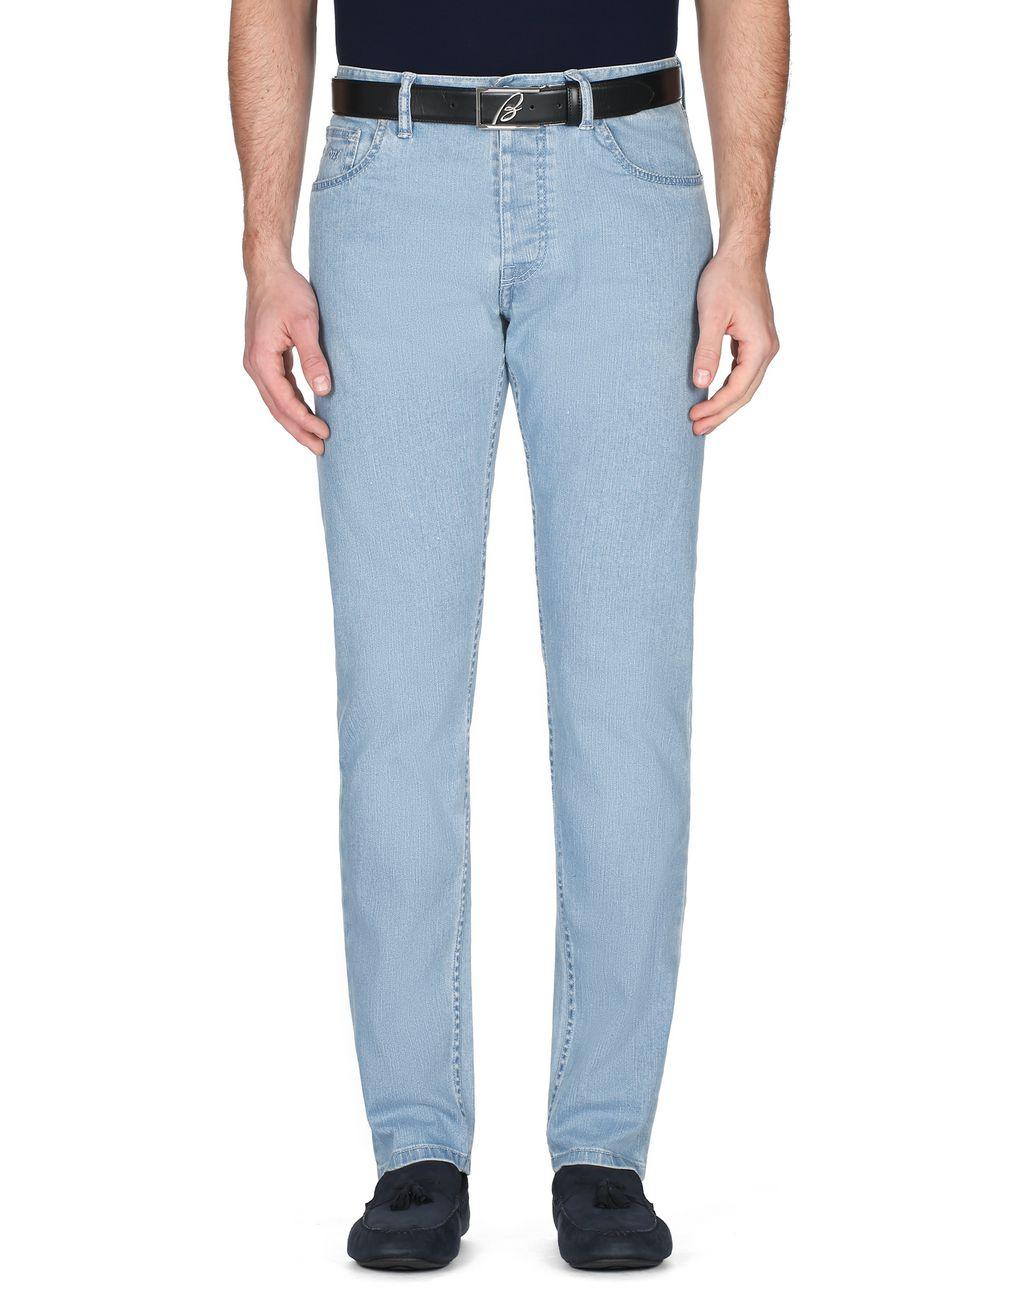 BRIONI Light Blue Denim Trousers Trousers Man r